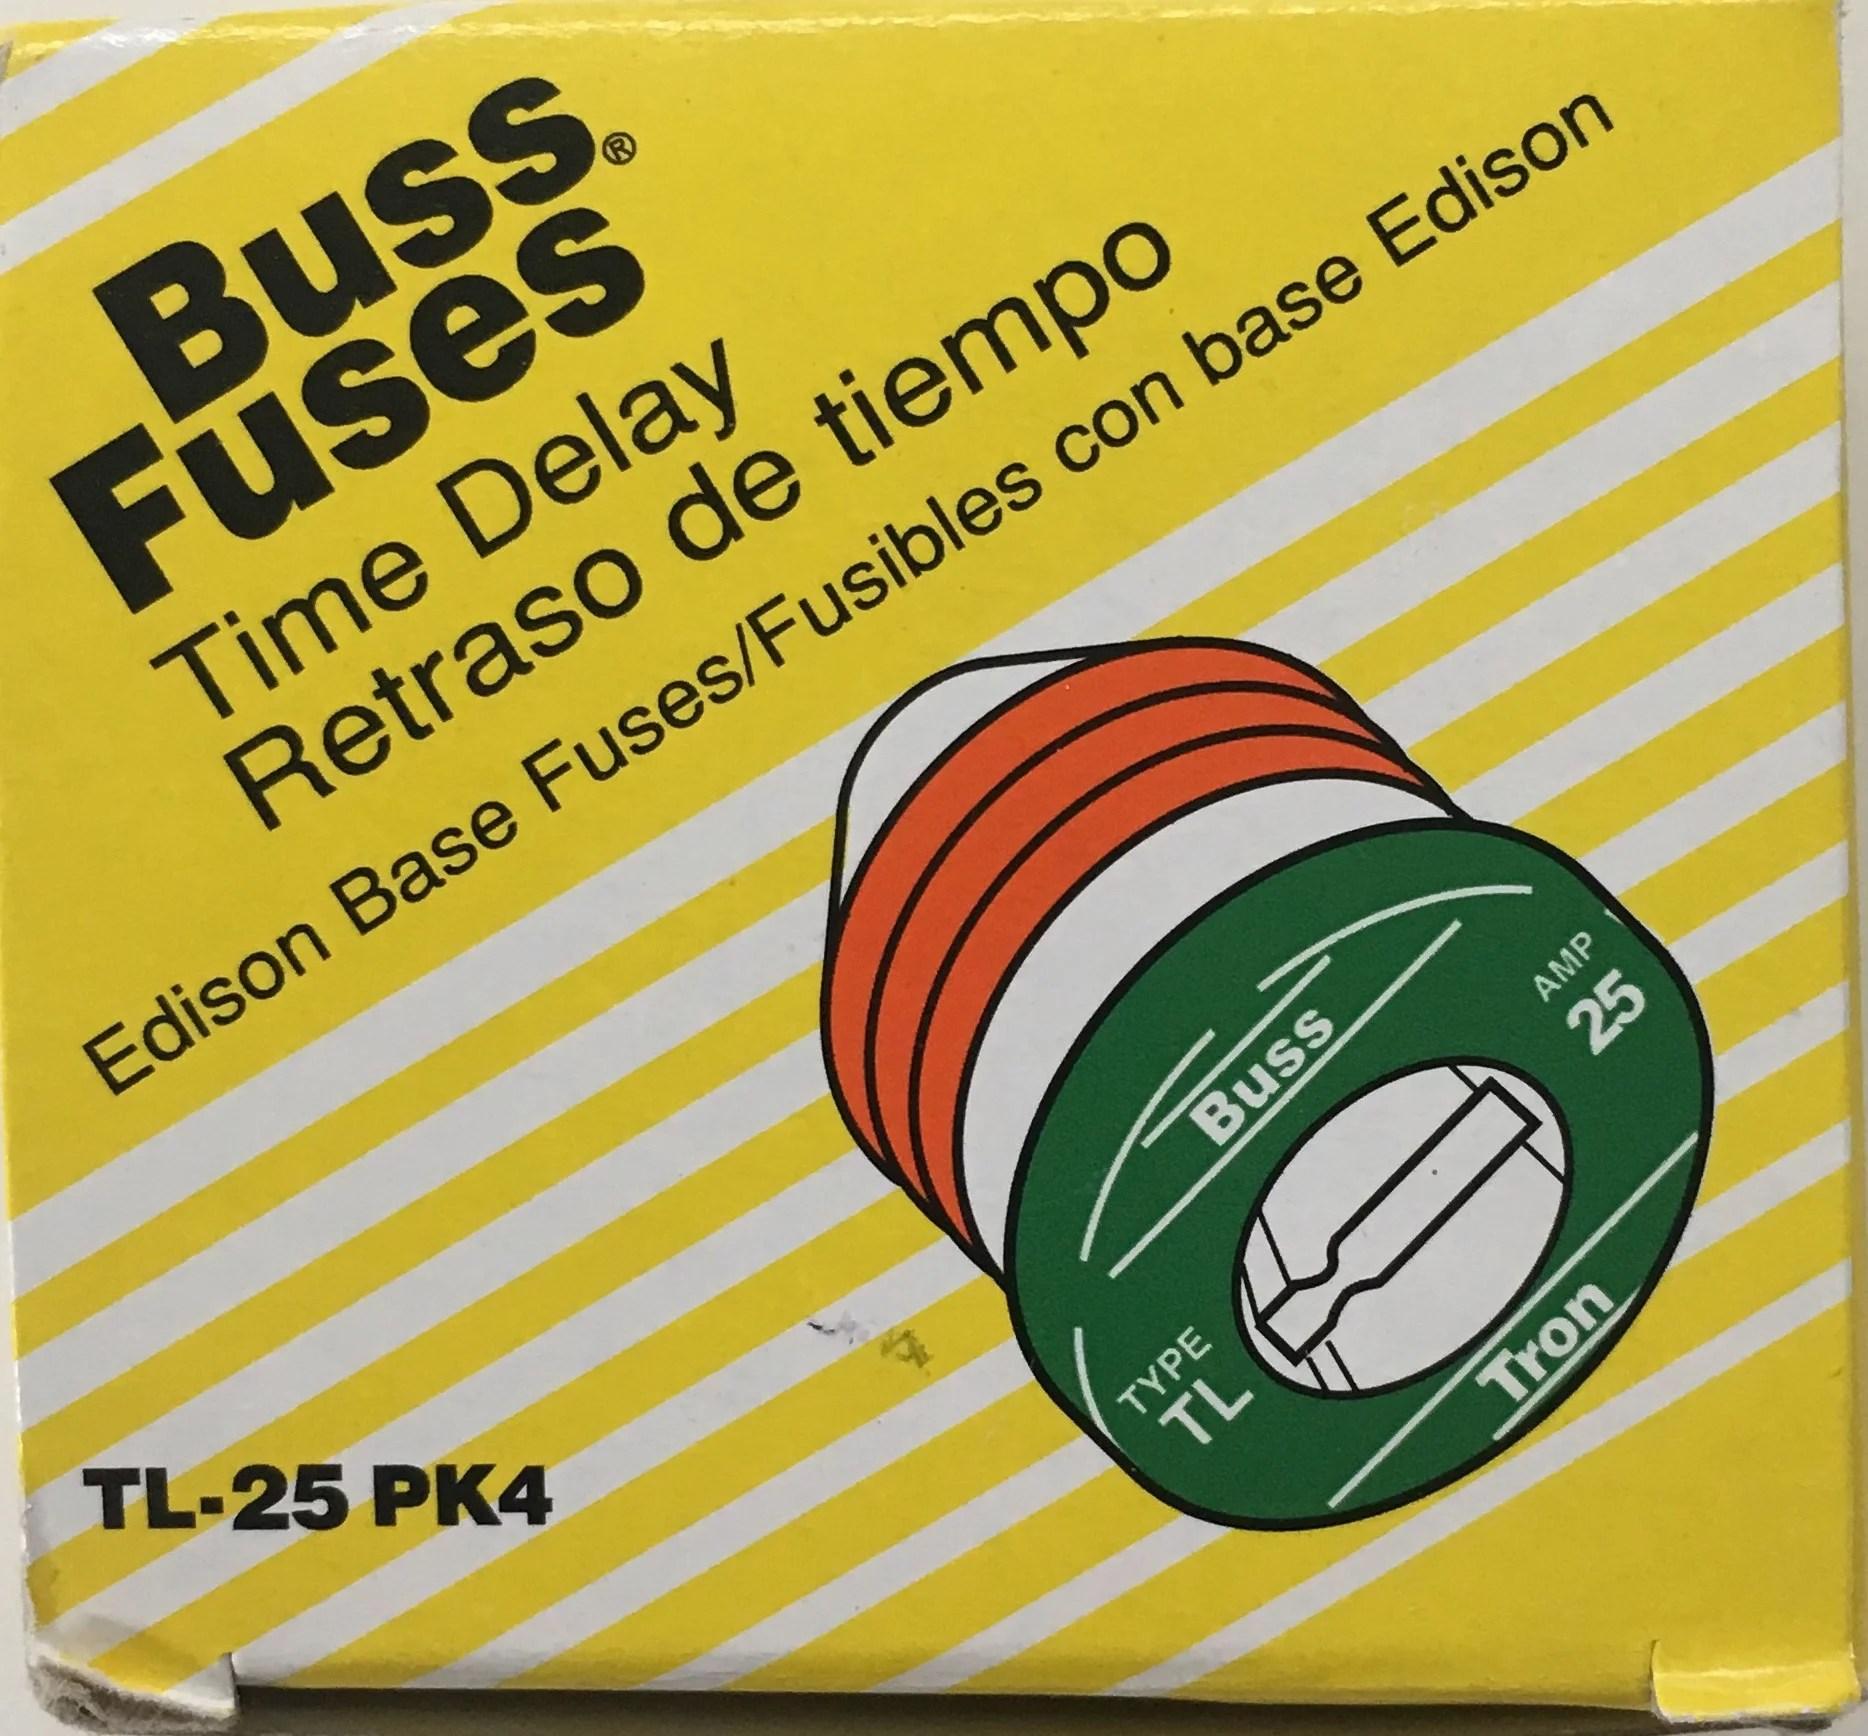 bussman tl 25pk4 box of 4 25 amp edison base plug fuse walmart com25 amp fuse [ 1868 x 1736 Pixel ]